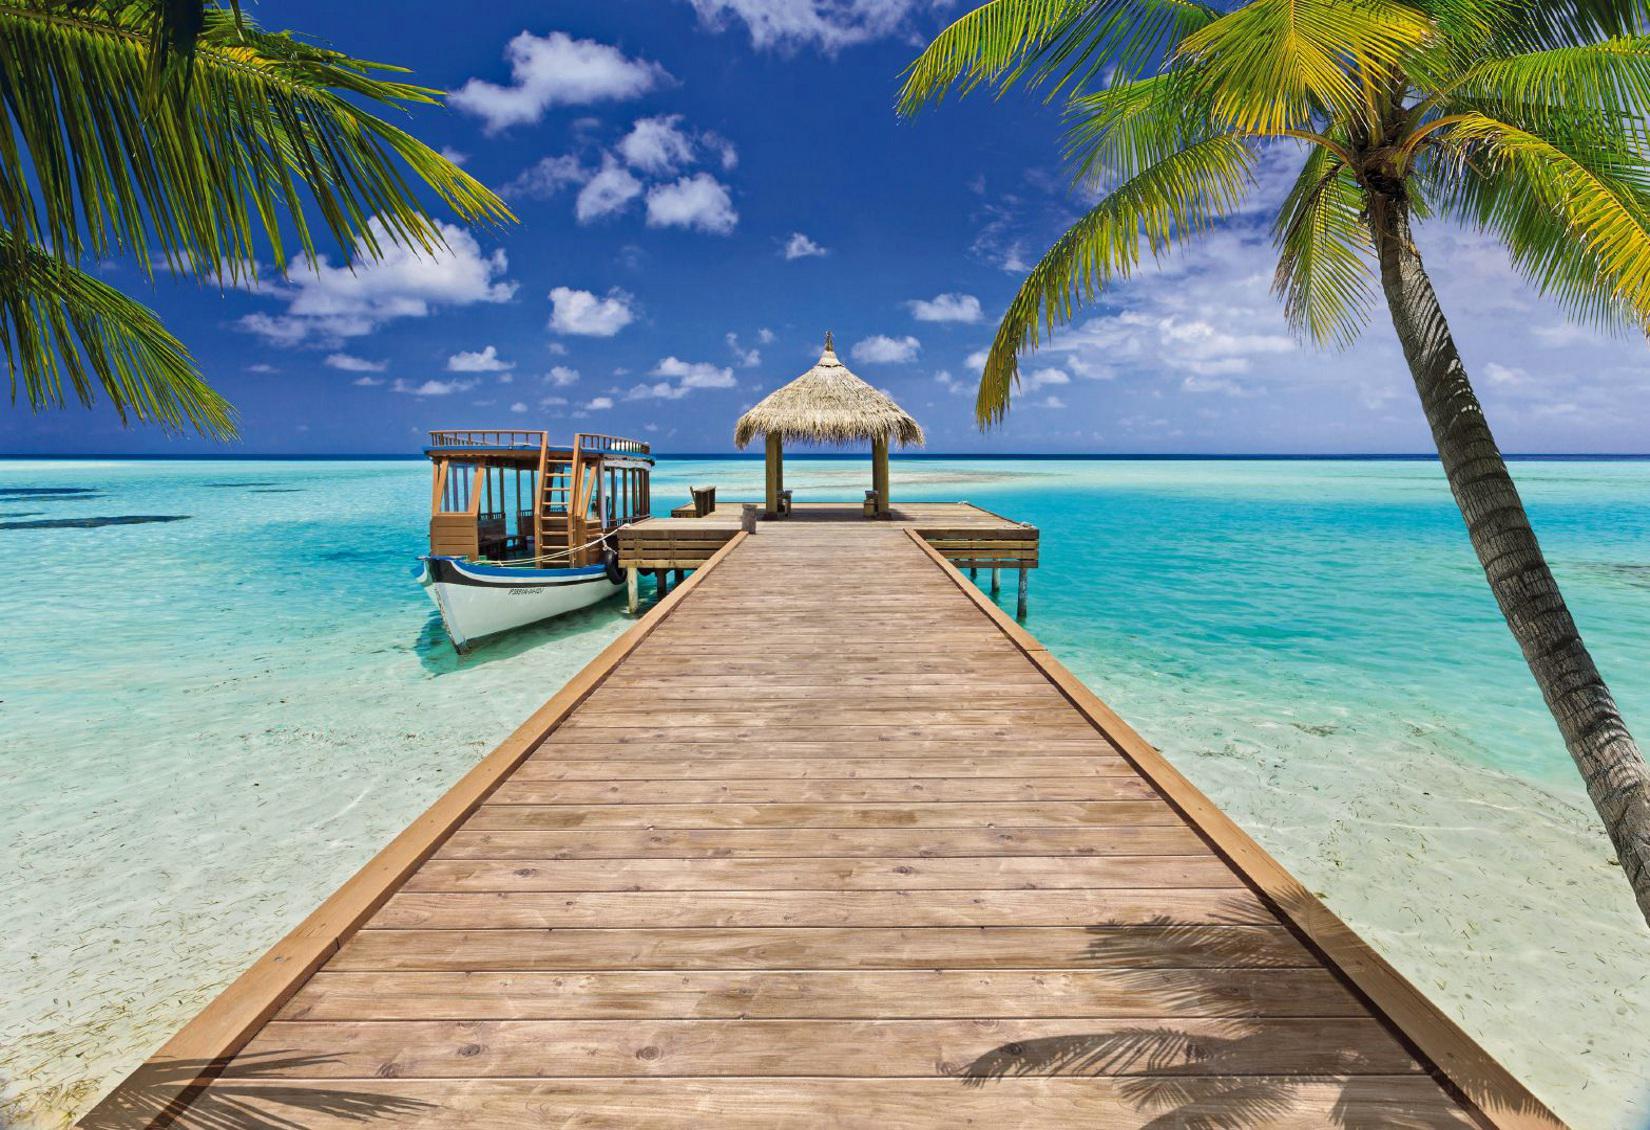 Beach-Resort-Wallpaper-03-1650x1130.jpg